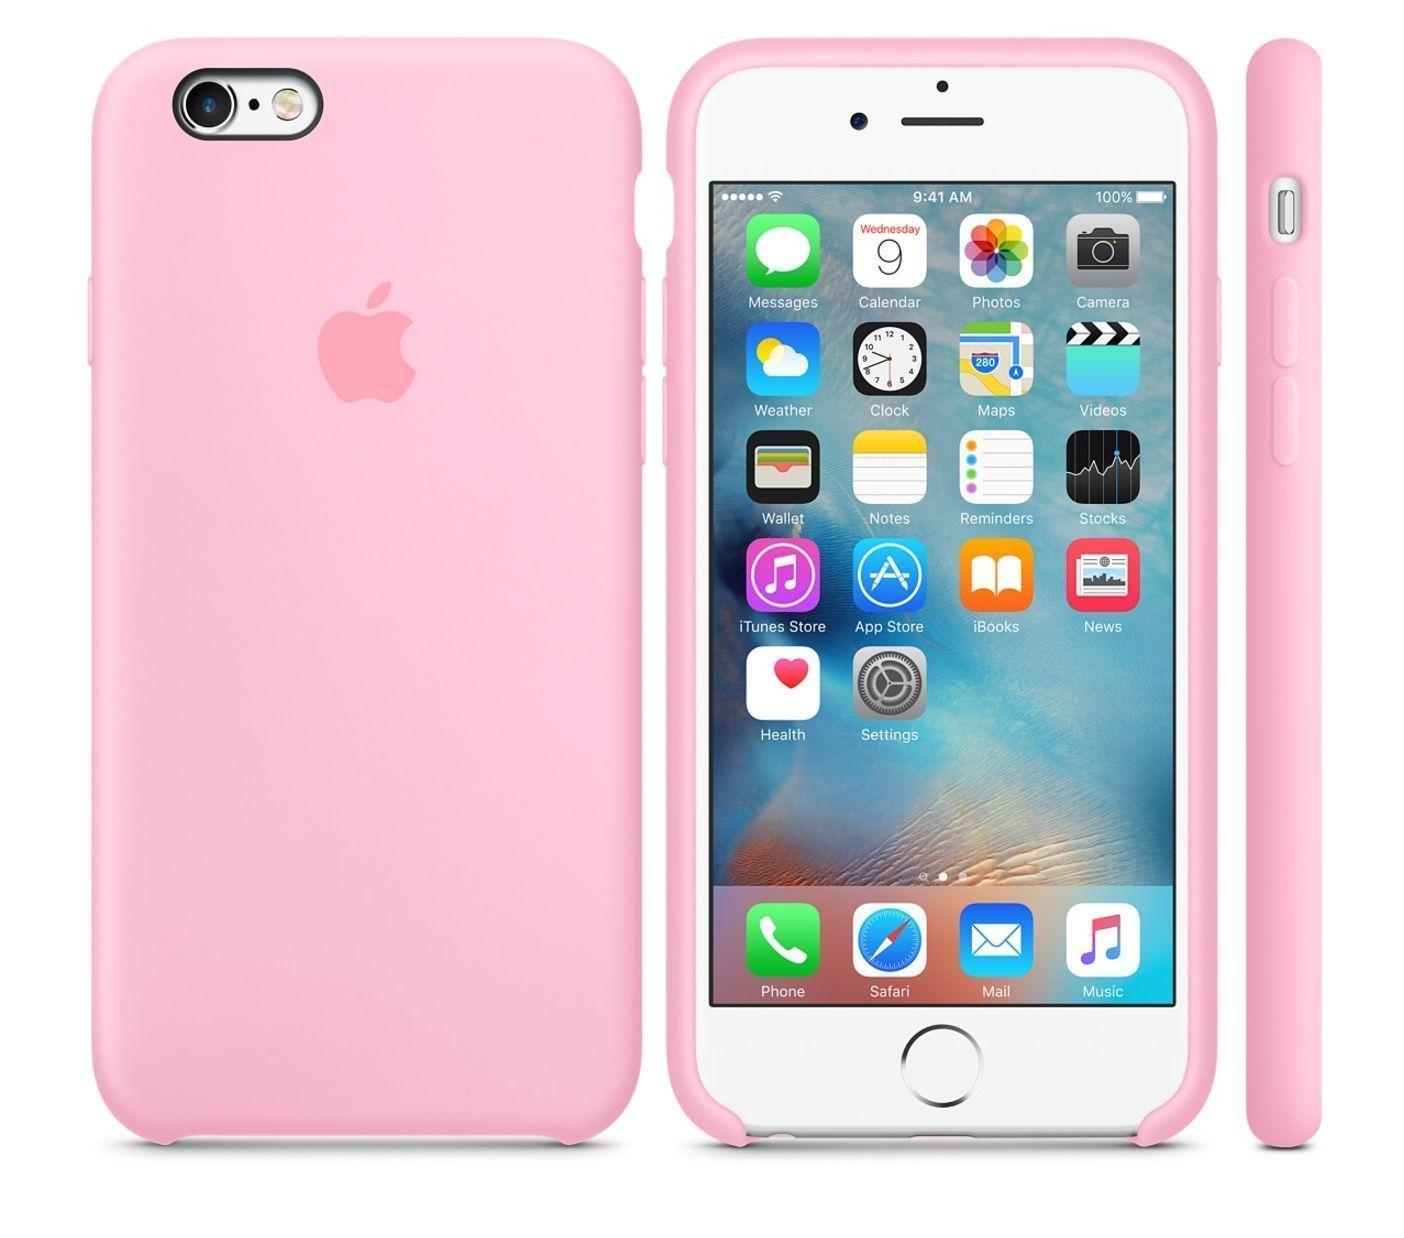 e95da3b84d5 Light Pink Genuine Apple Silicone Case For Iphone 6S 4.7